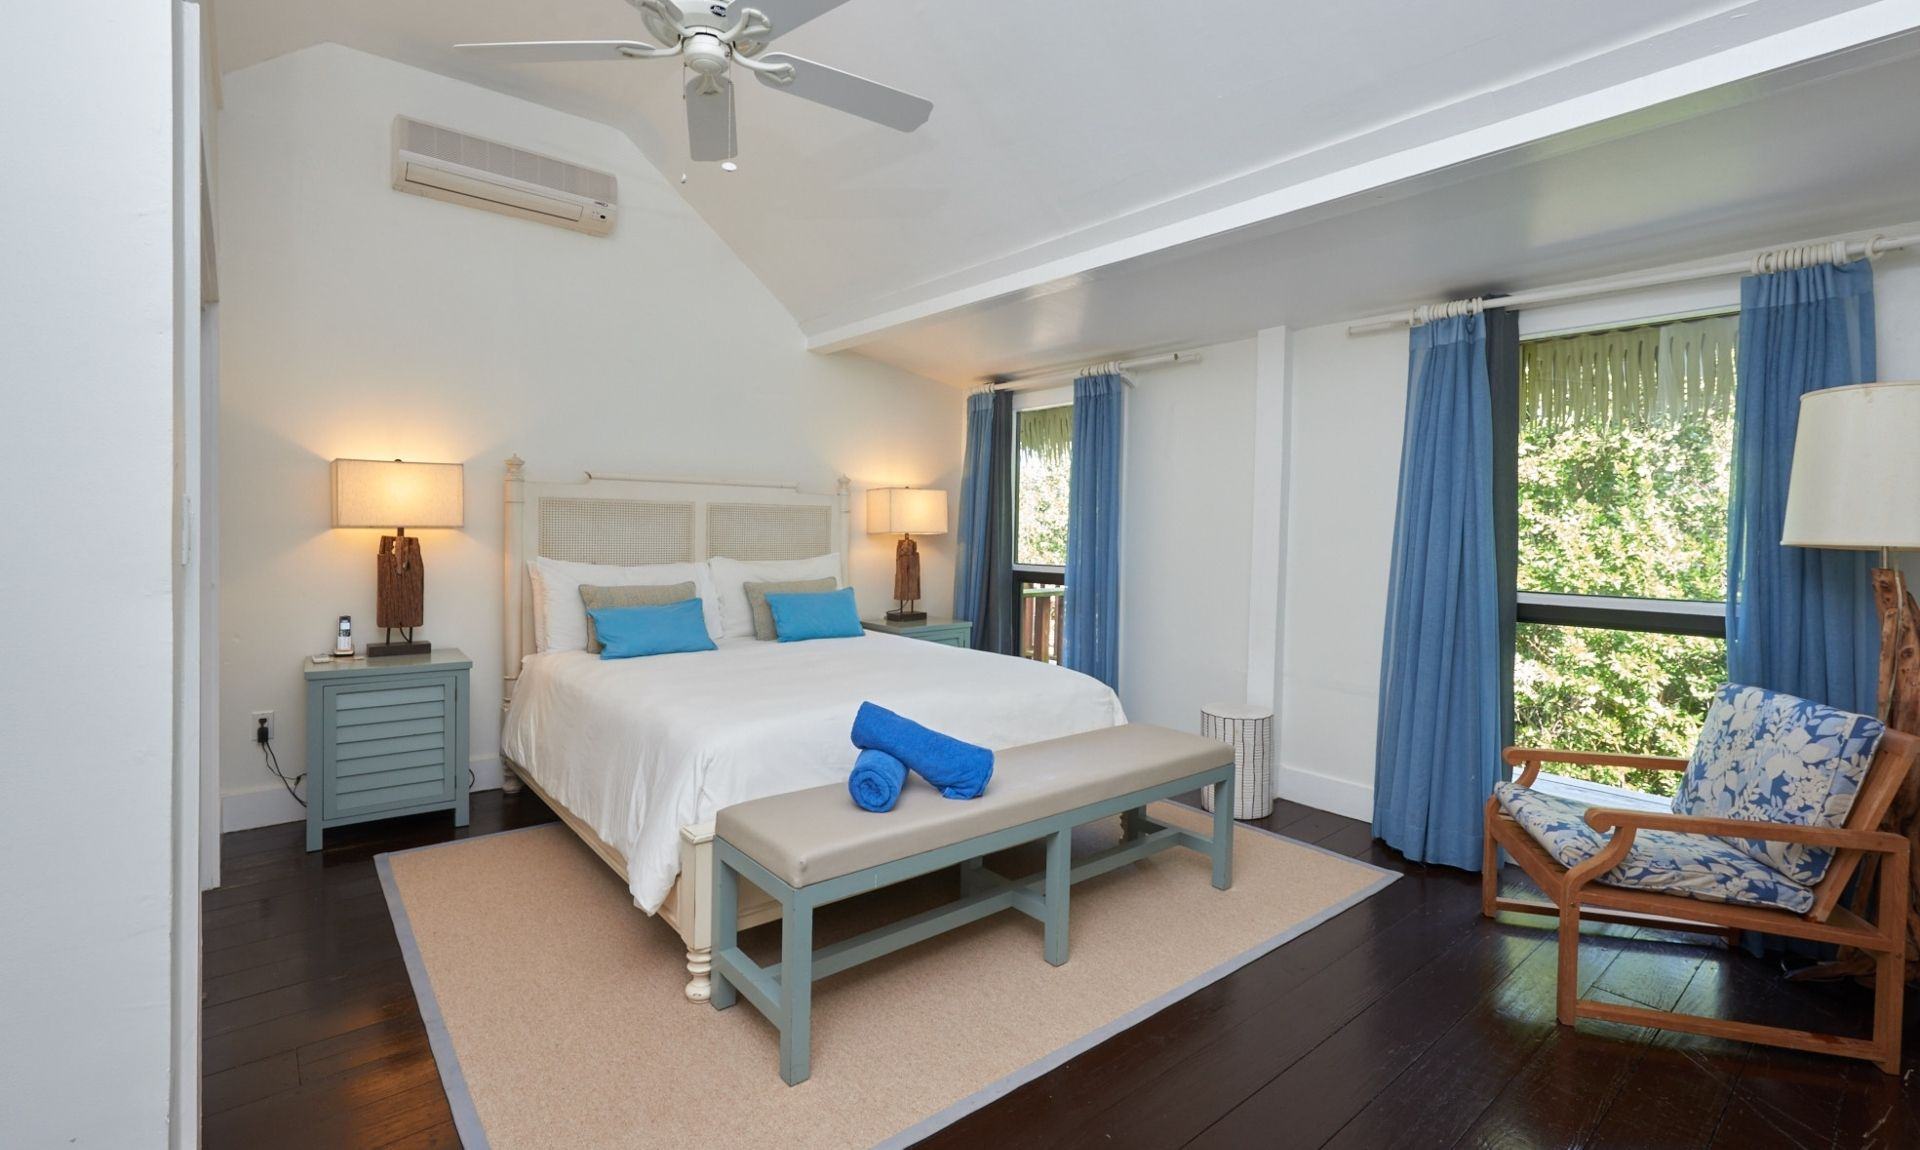 Bird's Nest double room